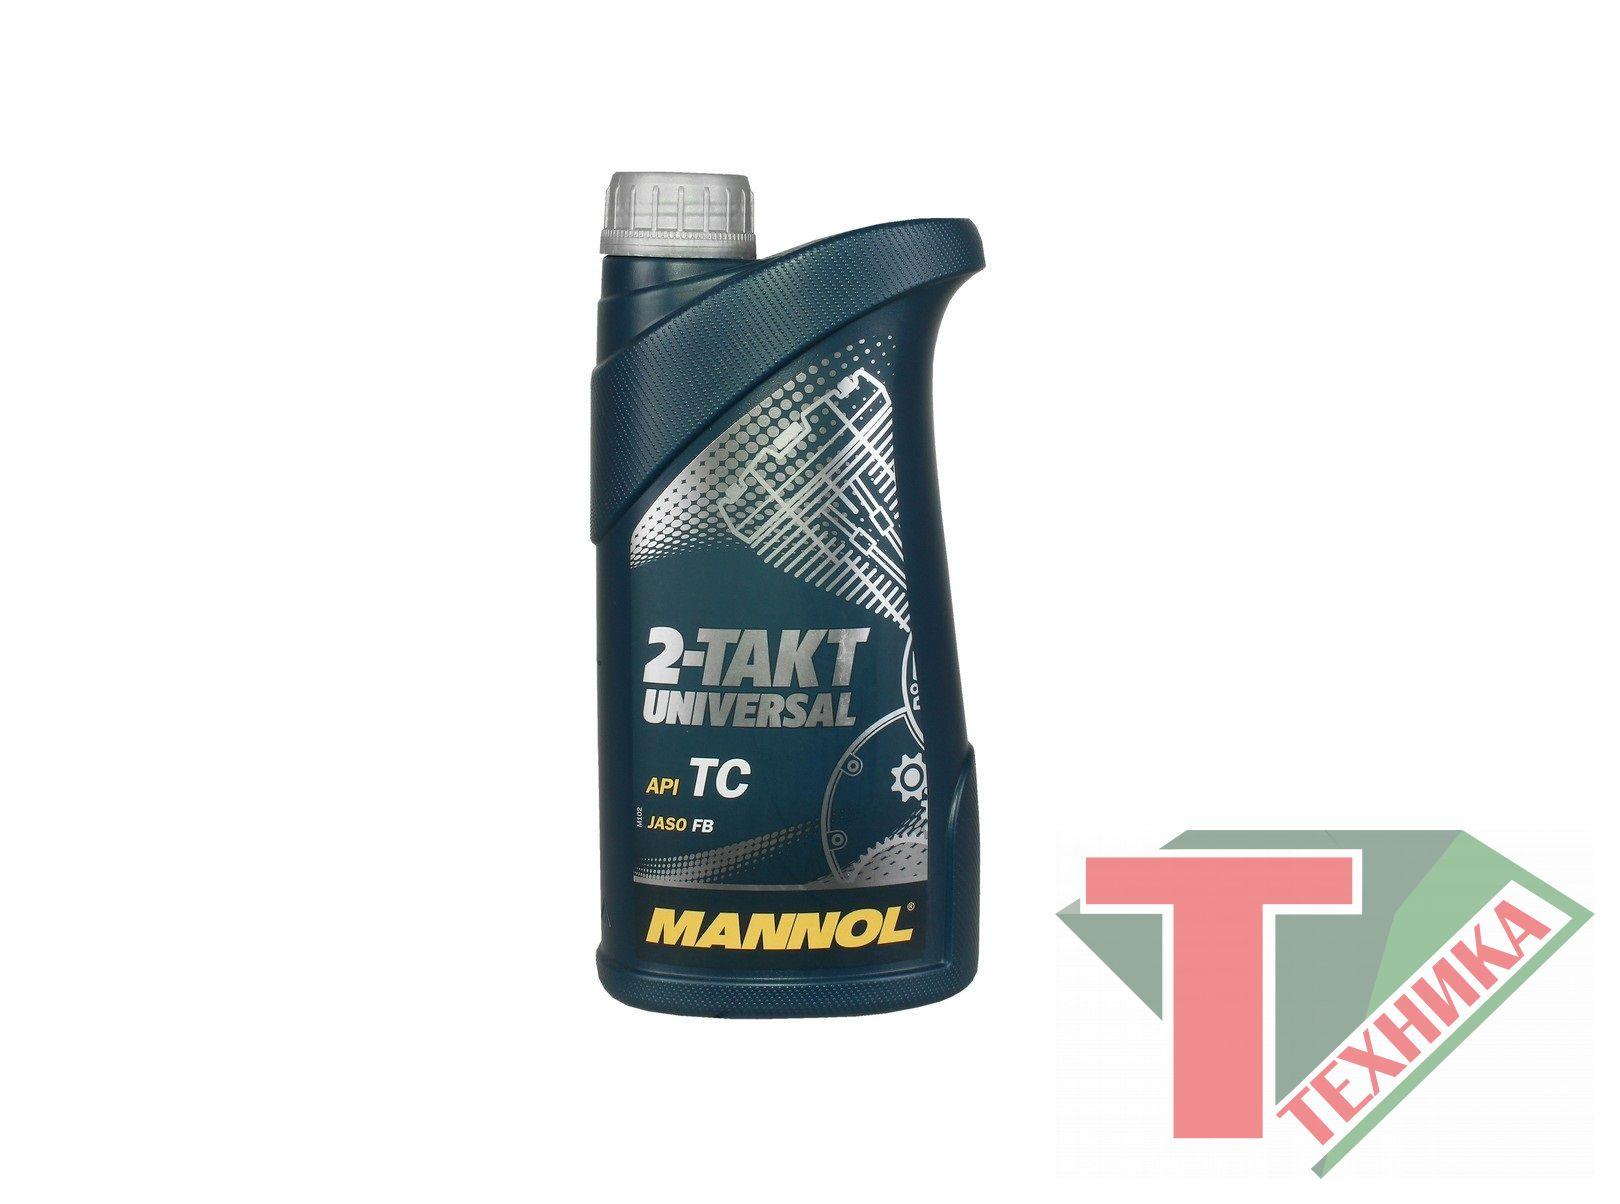 Mannol Universal минералка 2-такт.